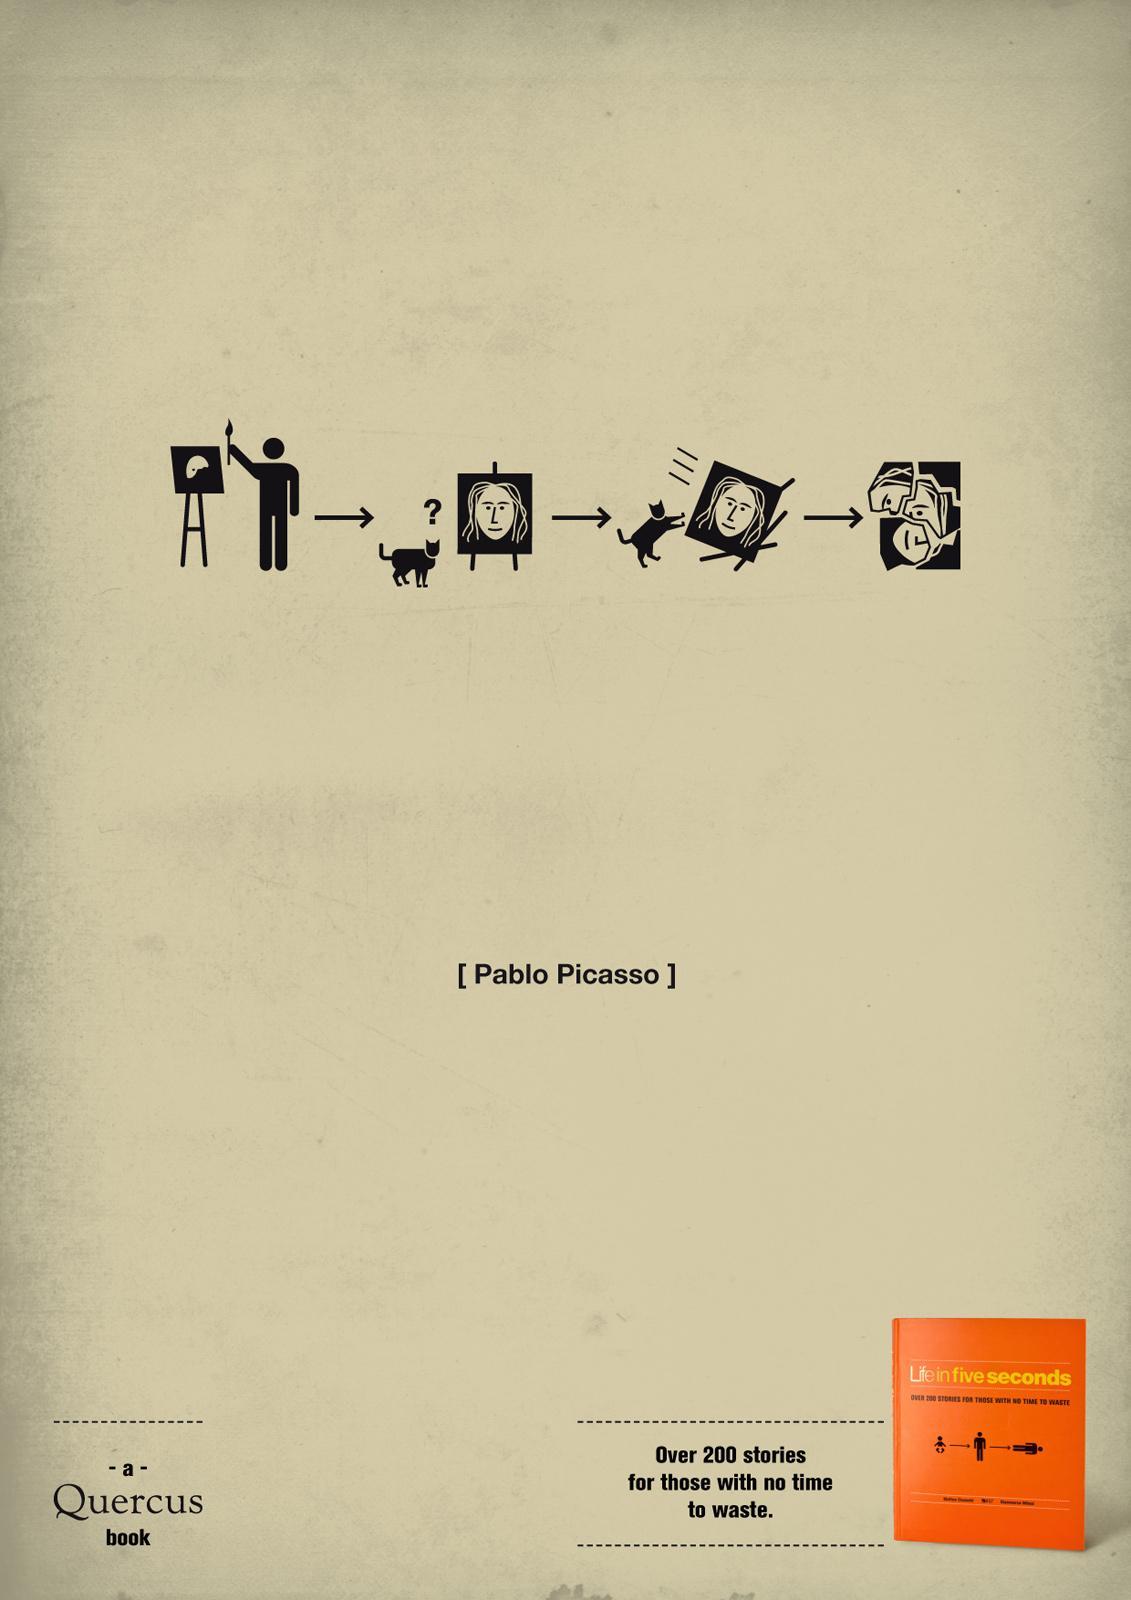 Quercus Books Print Ad -  Life in five seconds, Pablo Picasso